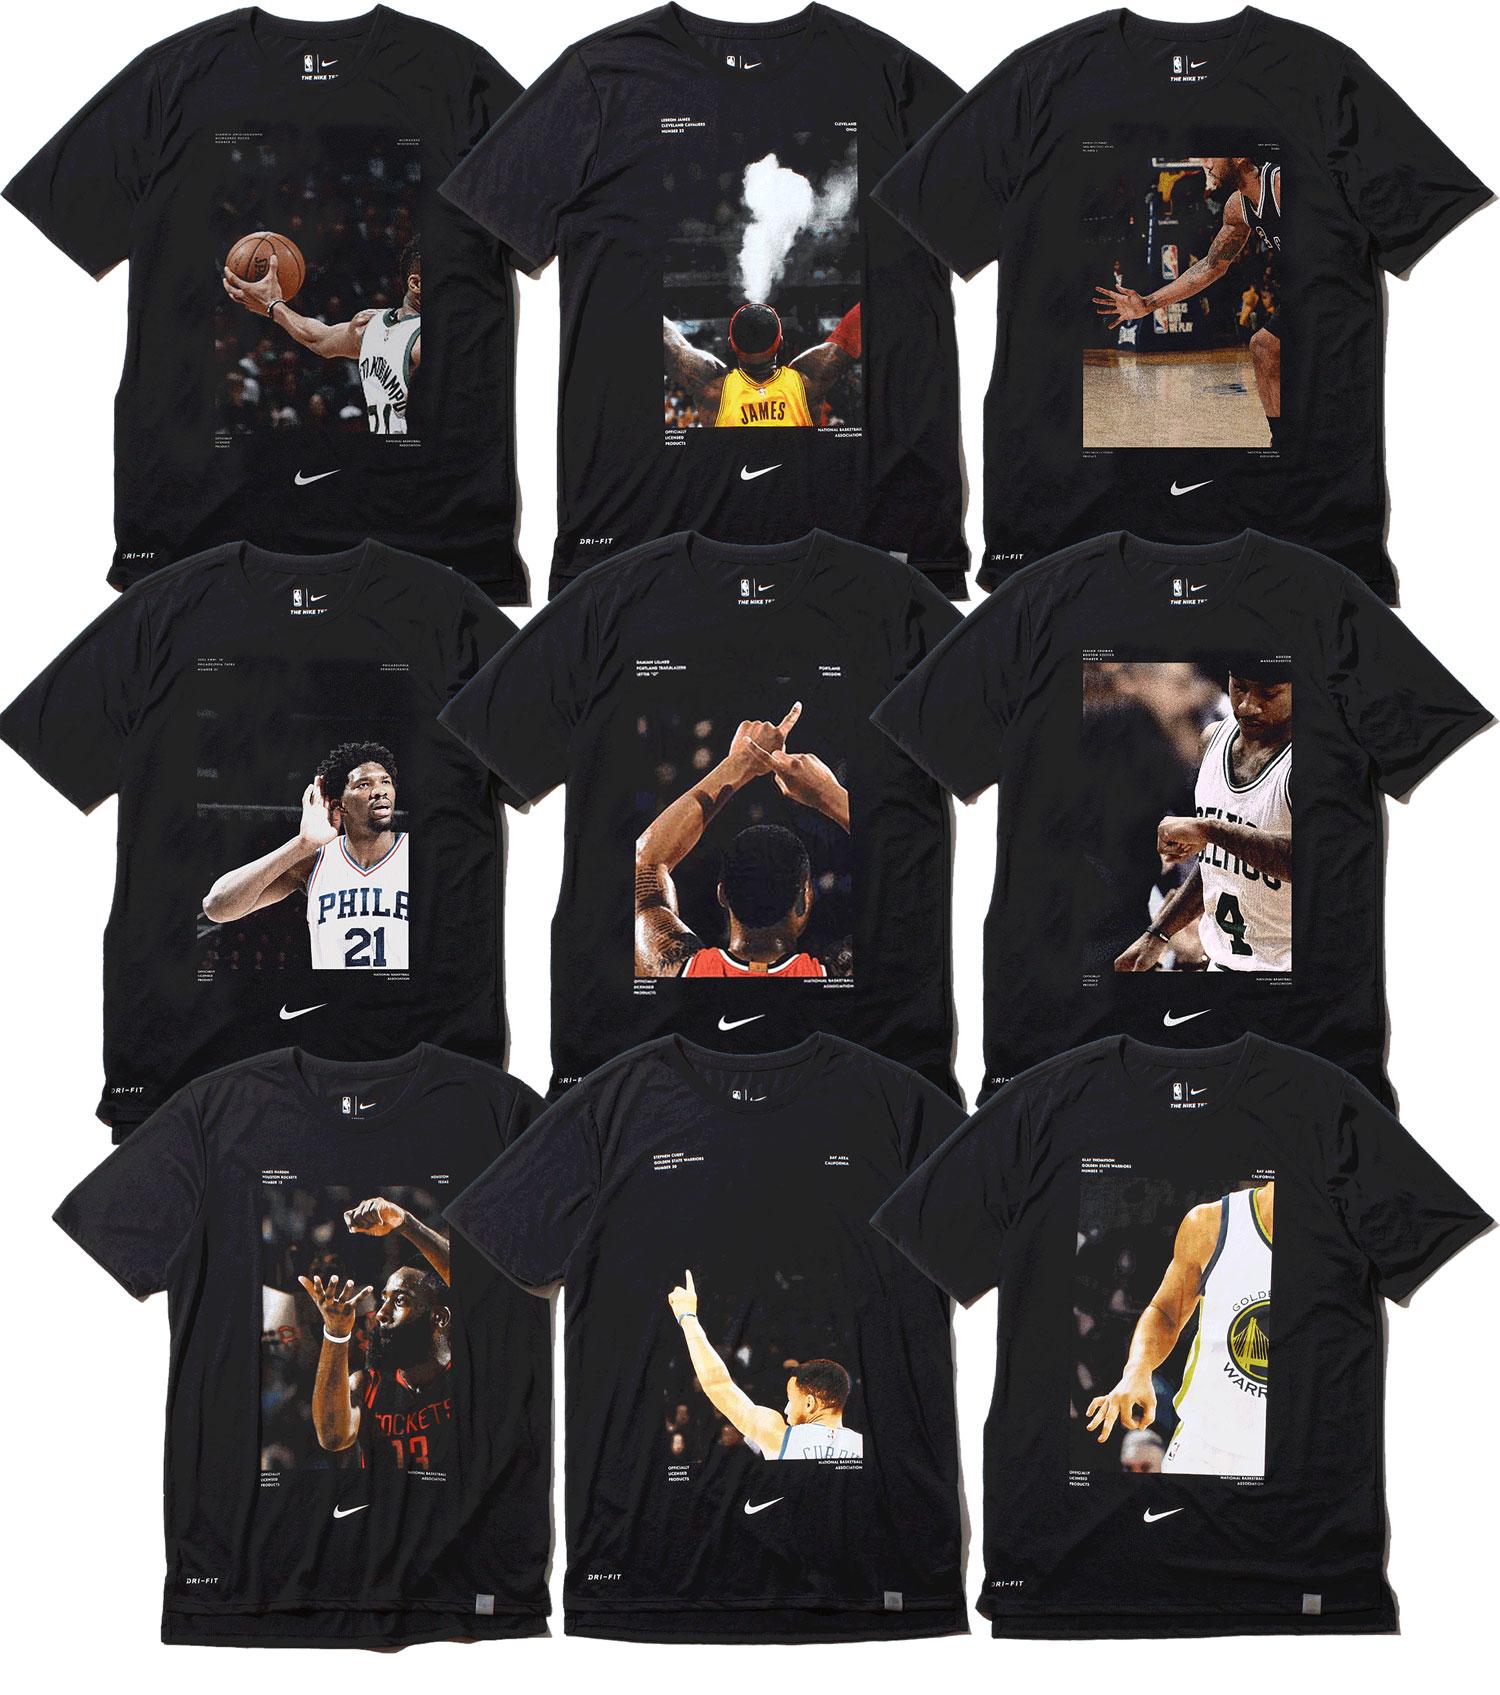 NIKE NBA PHOTO T-SHIRT COLLECTION